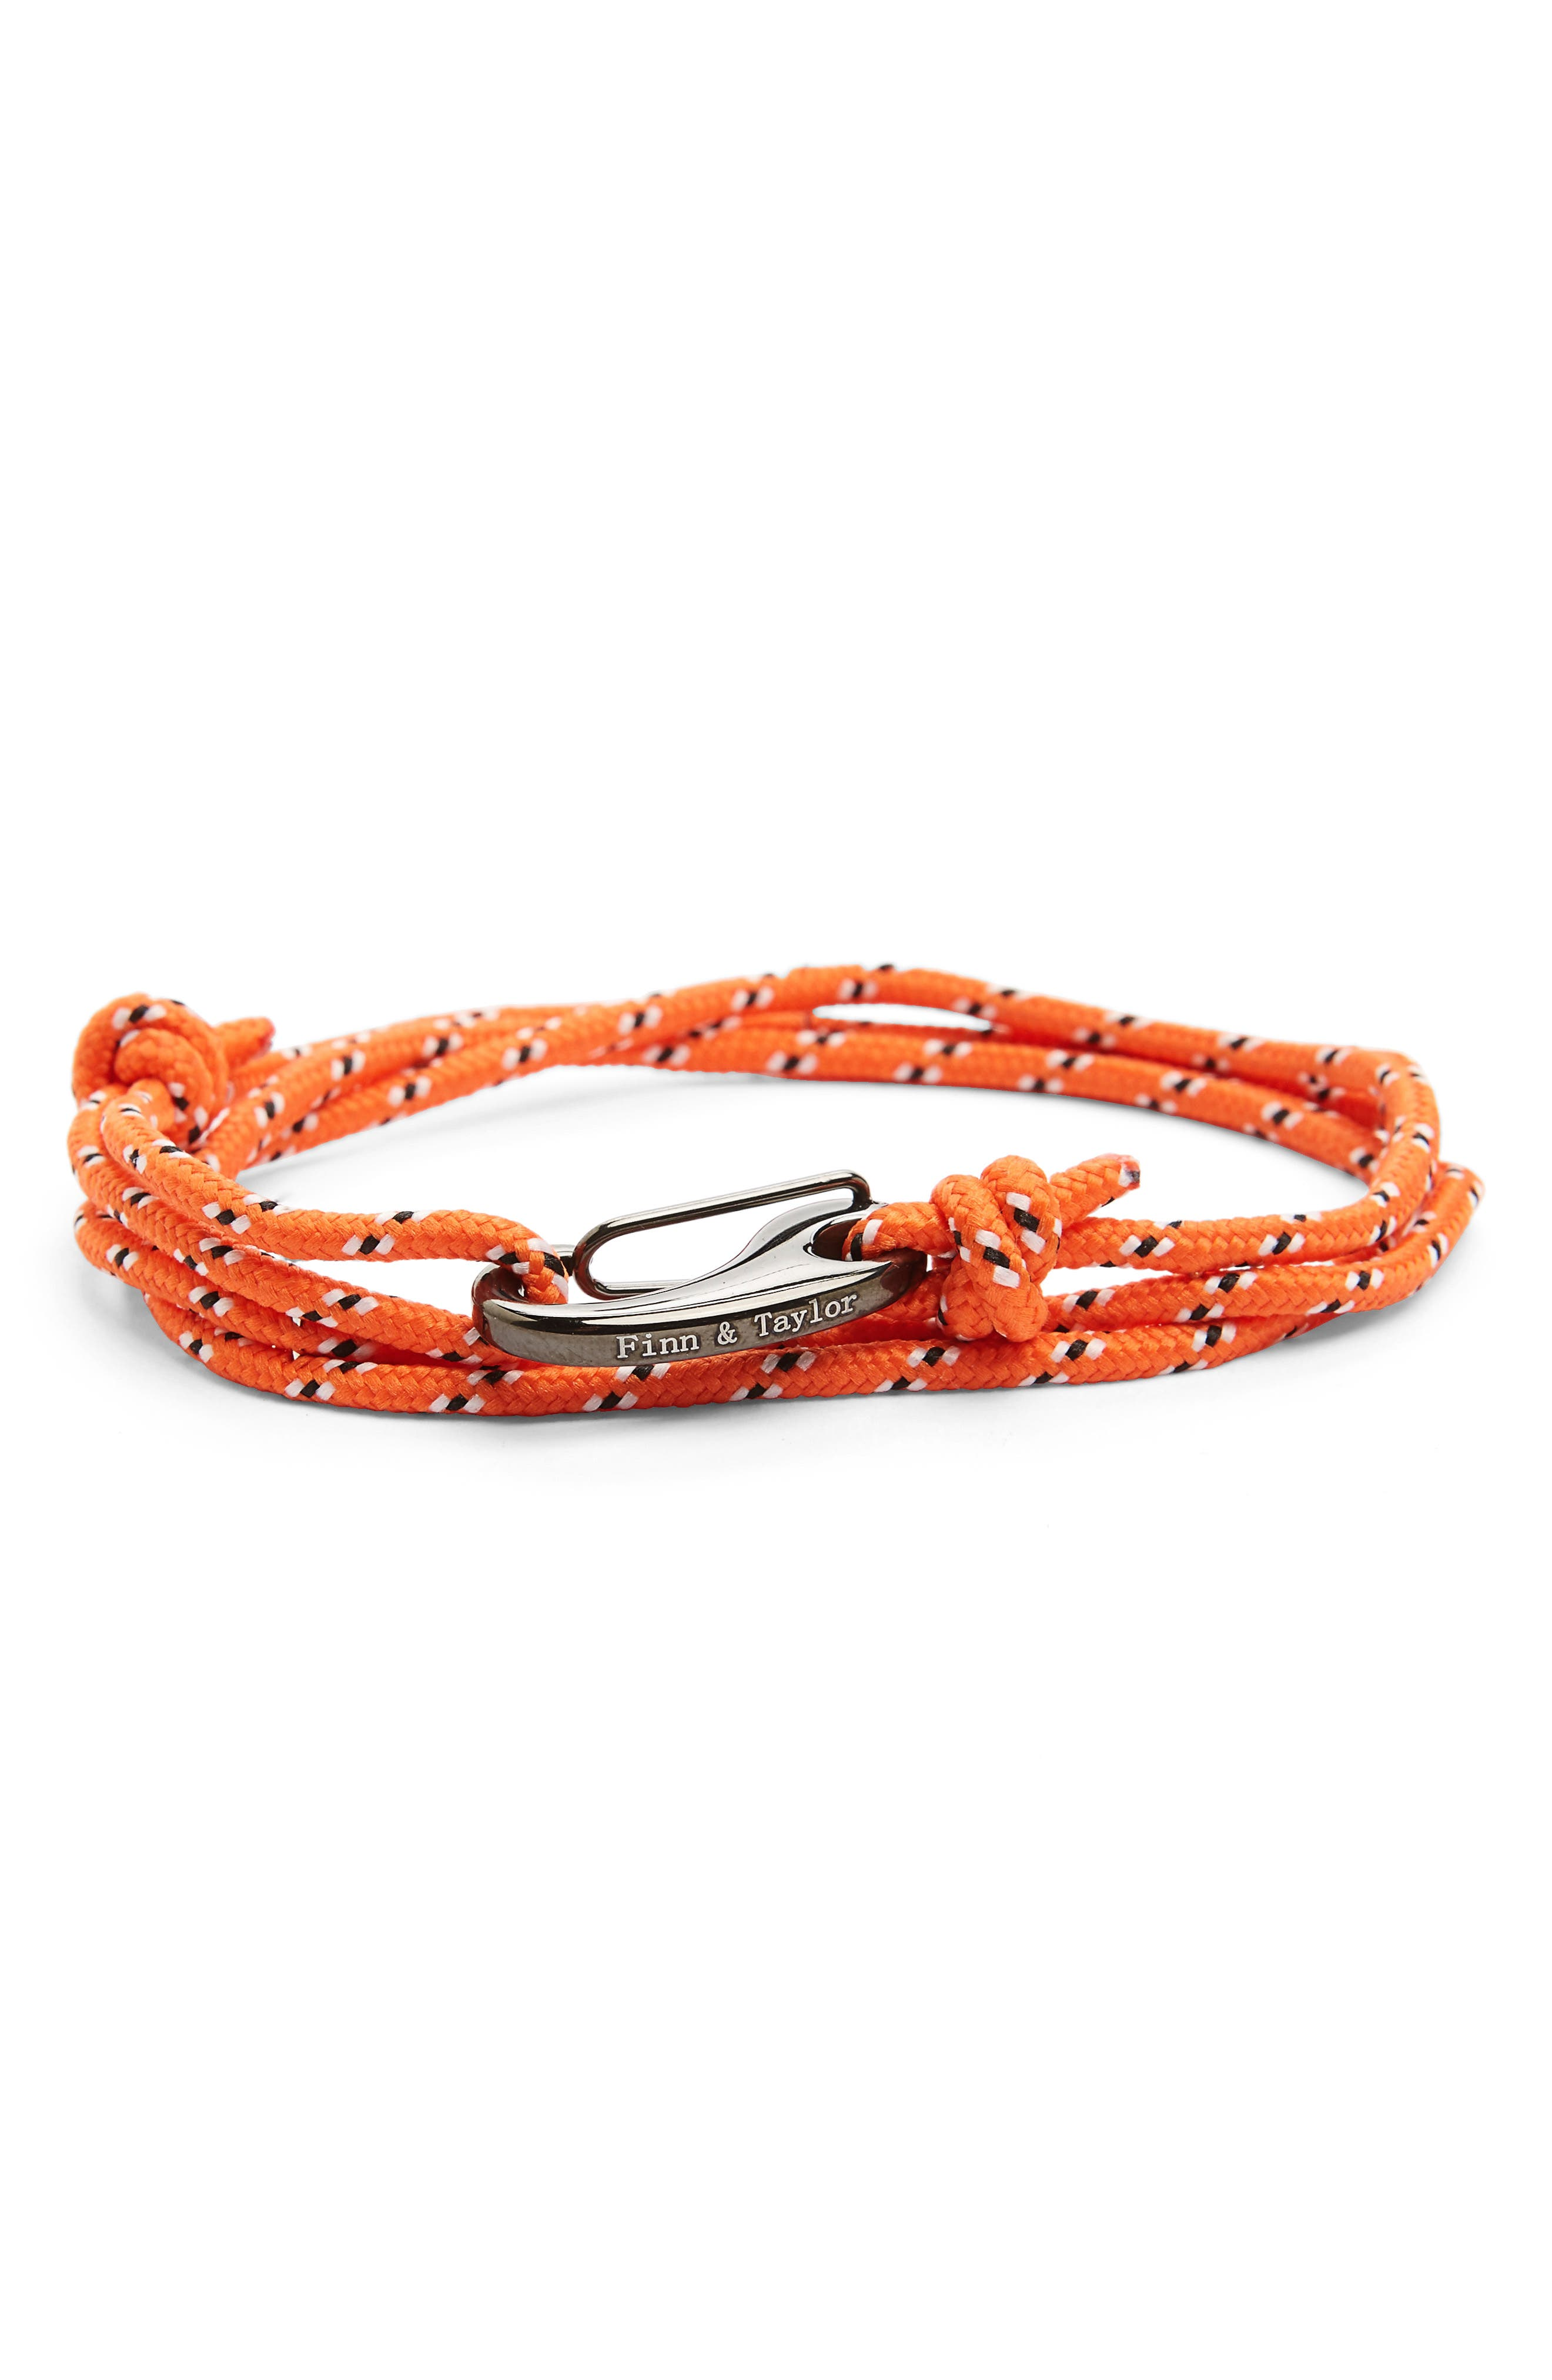 Finn & Taylor Wrap Bracelet